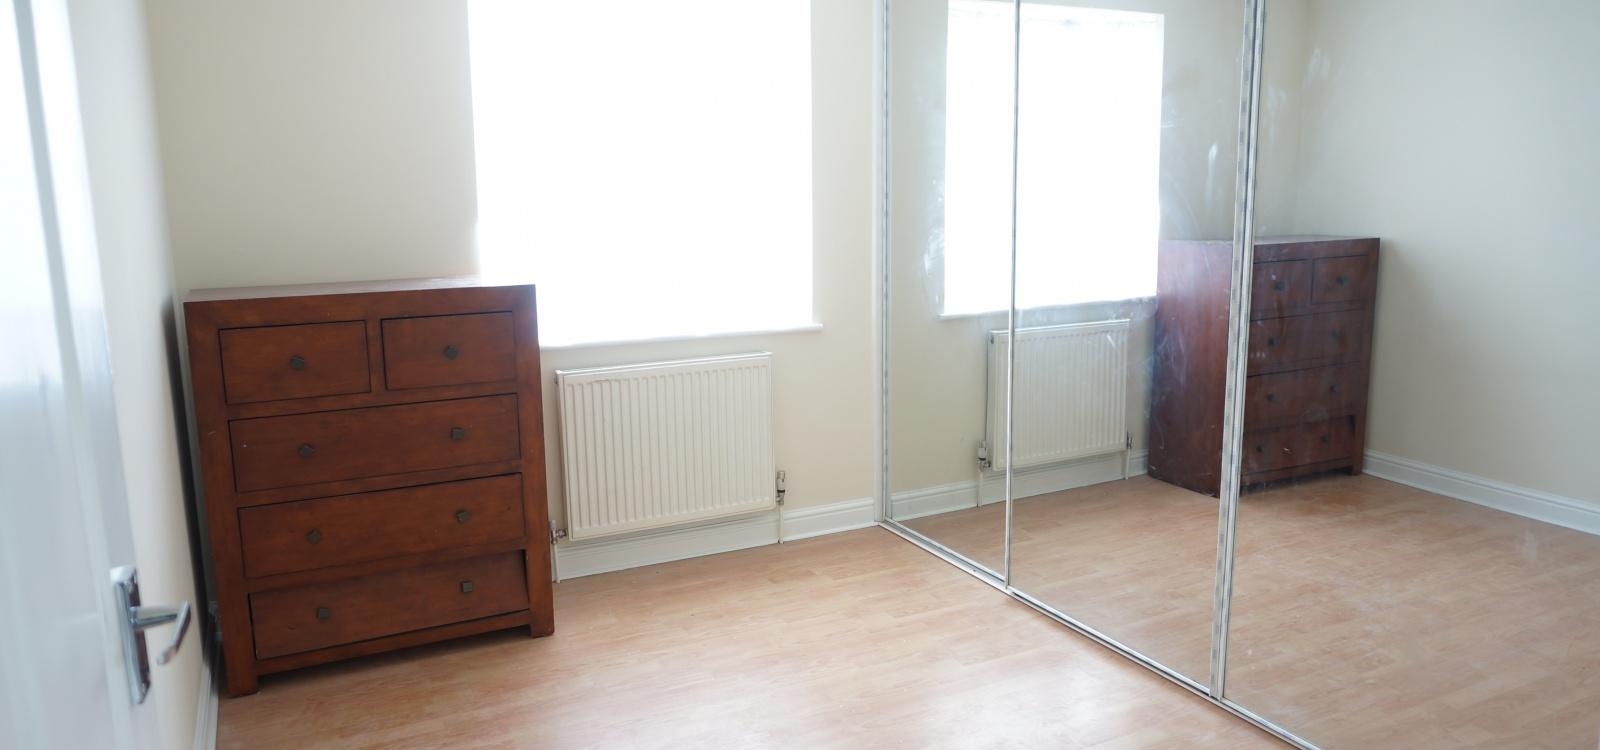 Chesterton Way,Tilbury,Essex,United Kingdom,1 BathroomBathrooms,House,Chesterton Way,1041